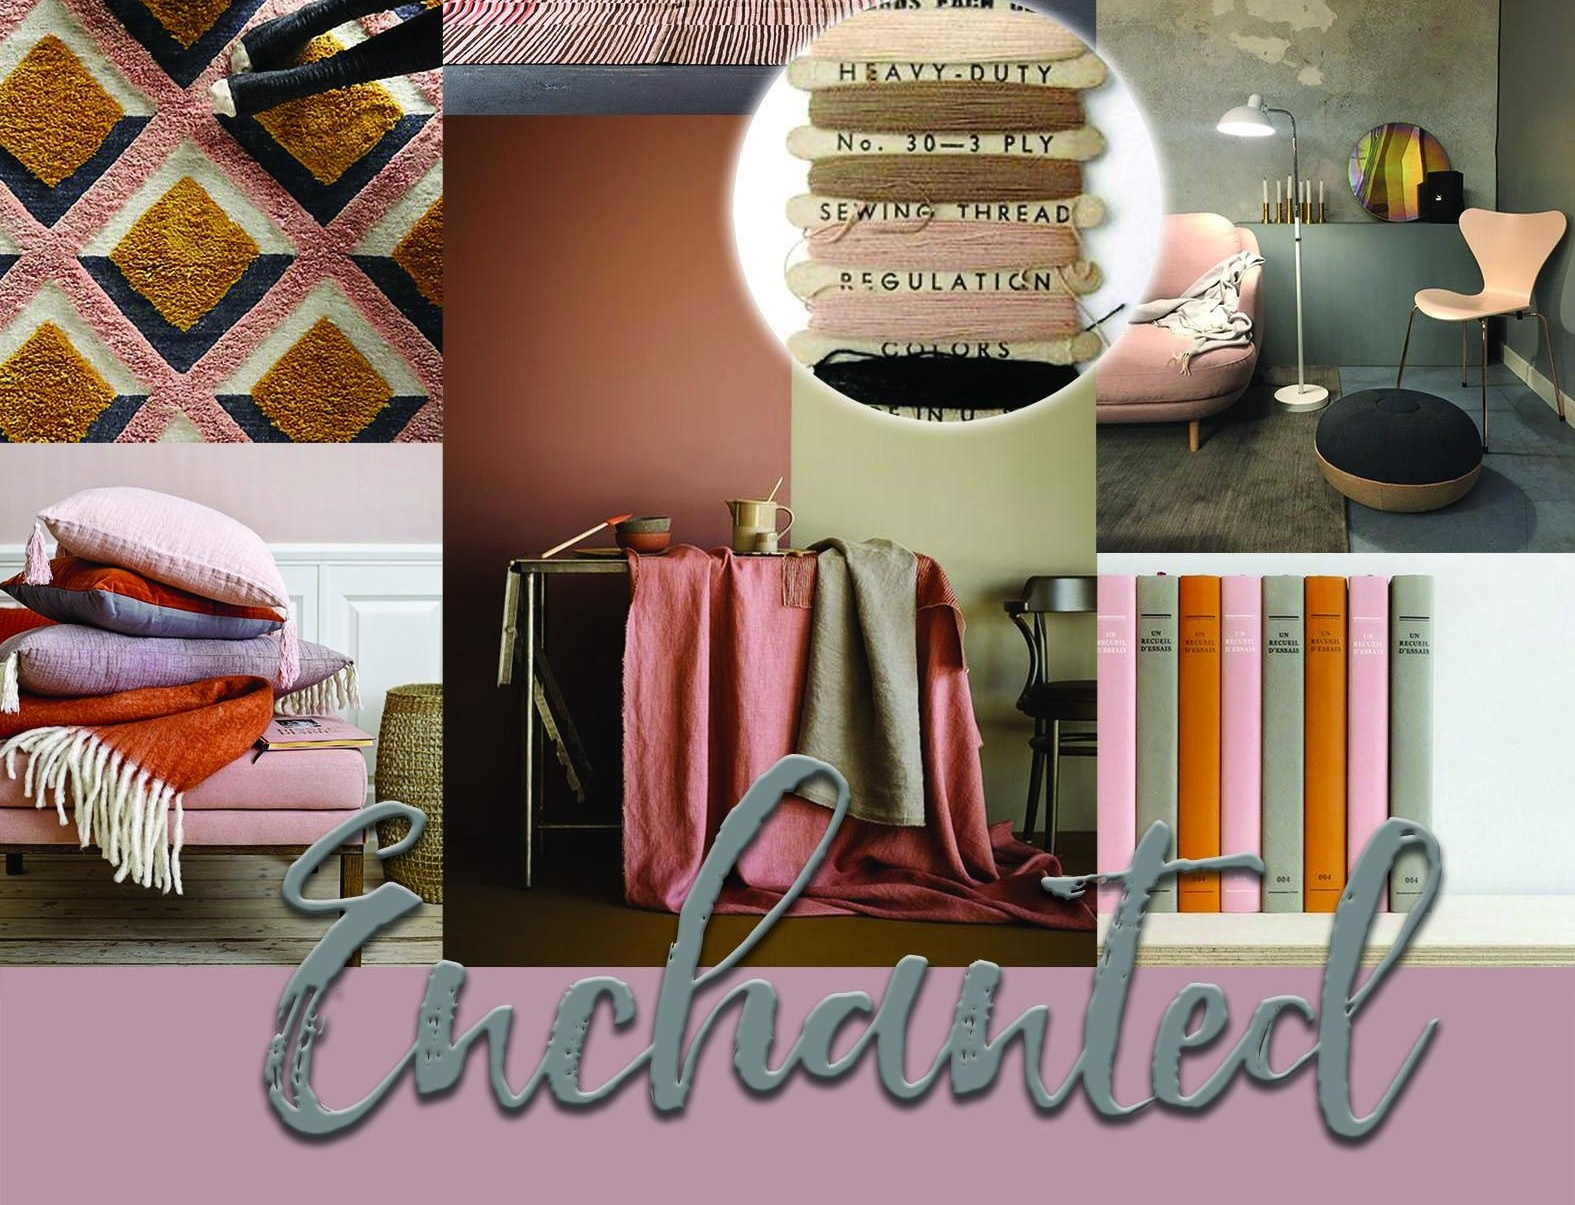 Enchanted (1)-922565-edited